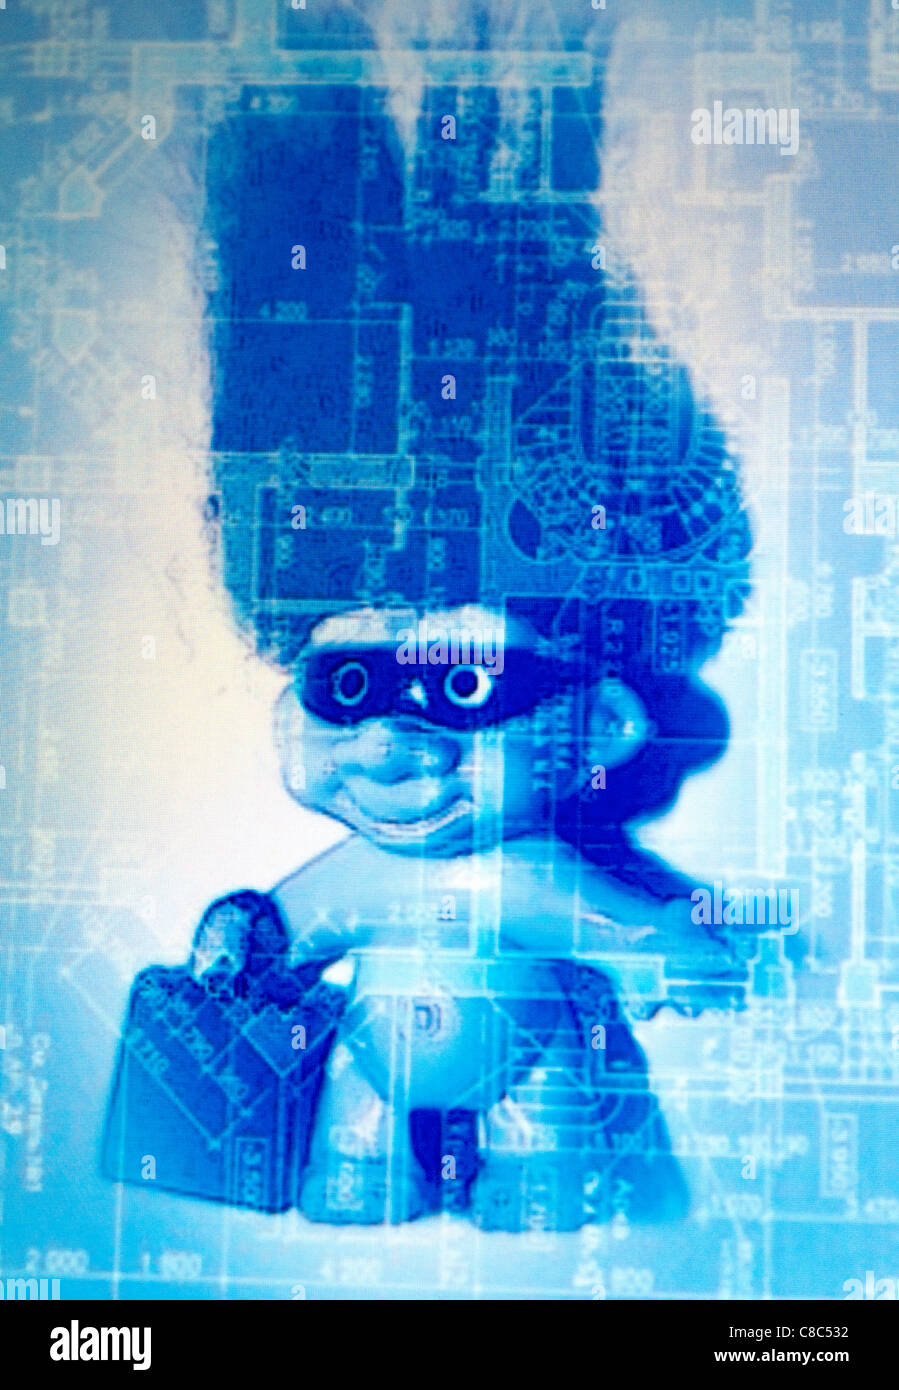 Patent troll on blueprint background. - Stock Image